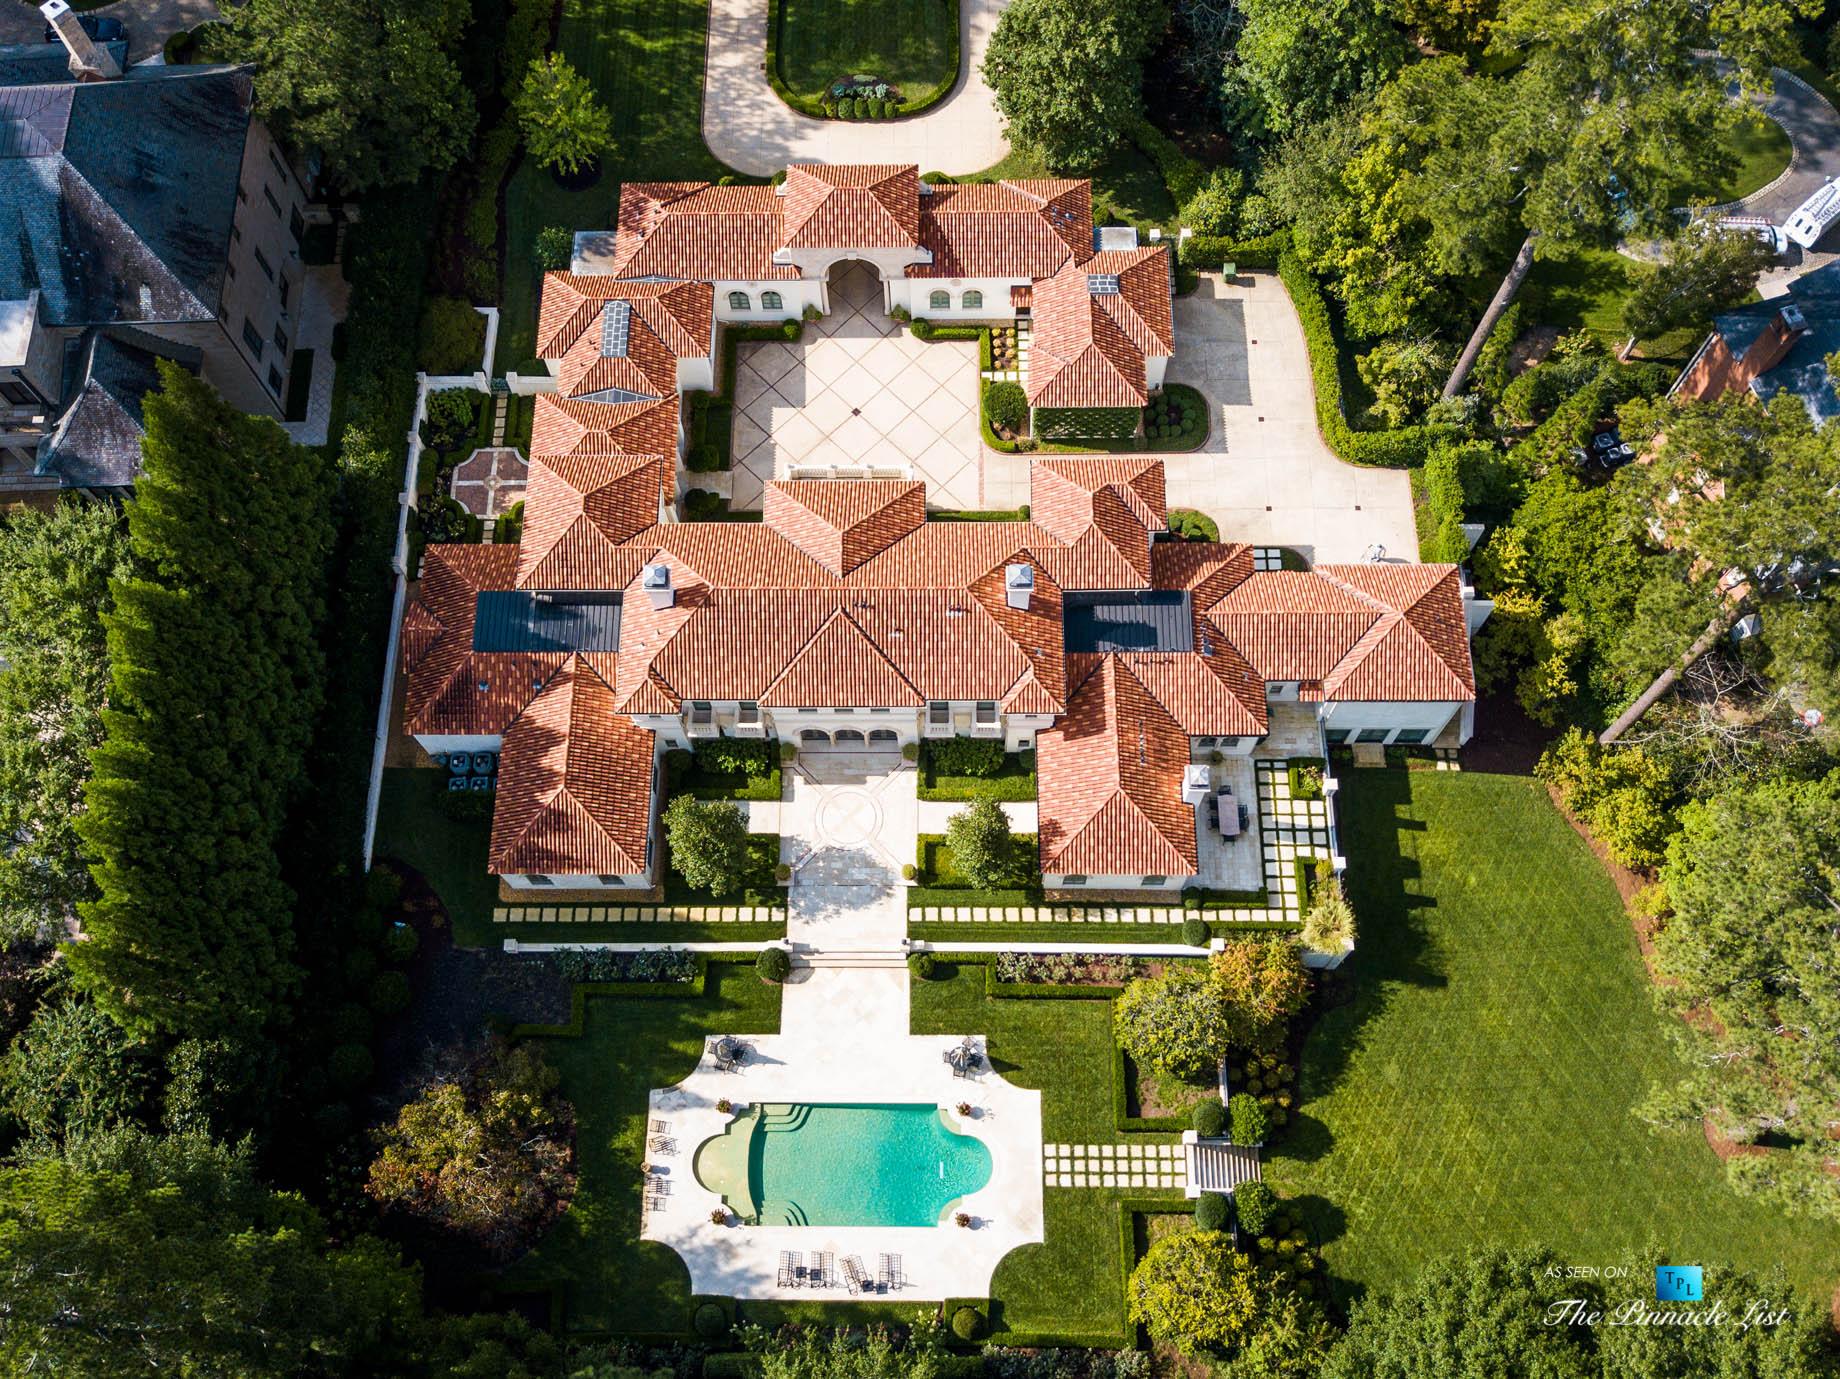 439 Blackland Rd NW, Atlanta, GA, USA – Drone Aerial View Luxurious Property – Luxury Real Estate – Tuxedo Park Mediterranean Mansion Home